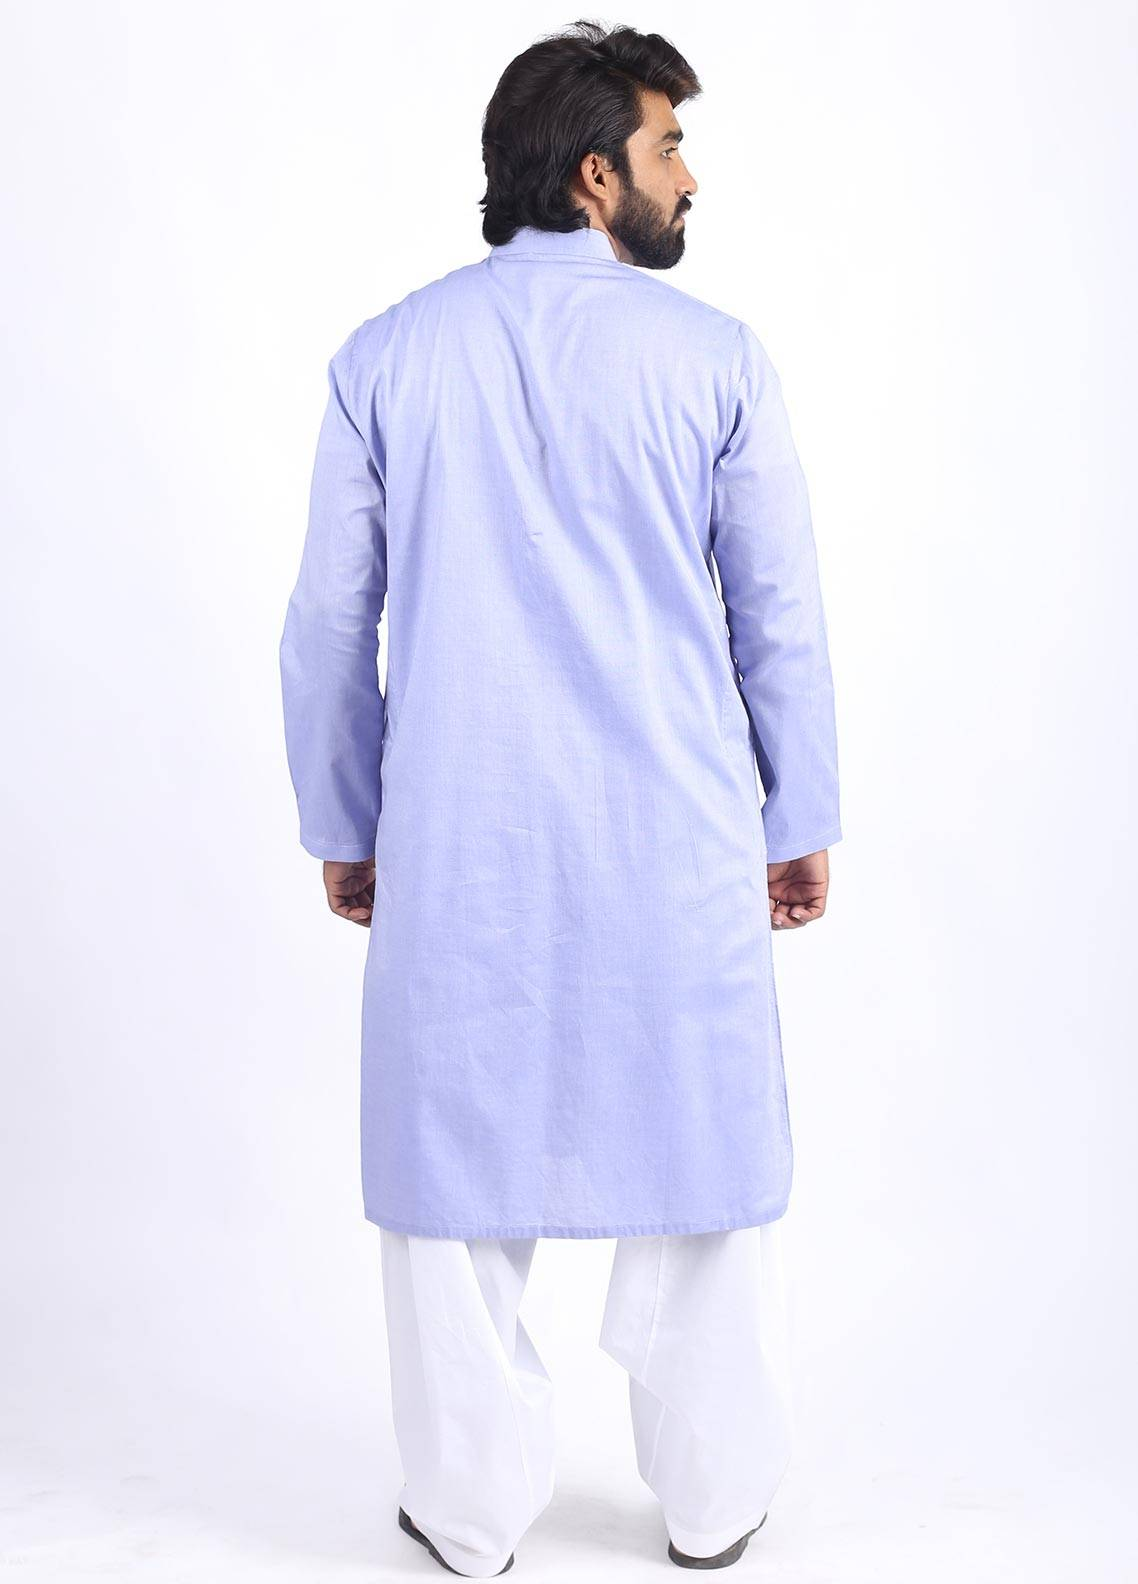 Sanaulla Exclusive Range Cotton Formal Kurtas for Men - Blue SAM18K 01